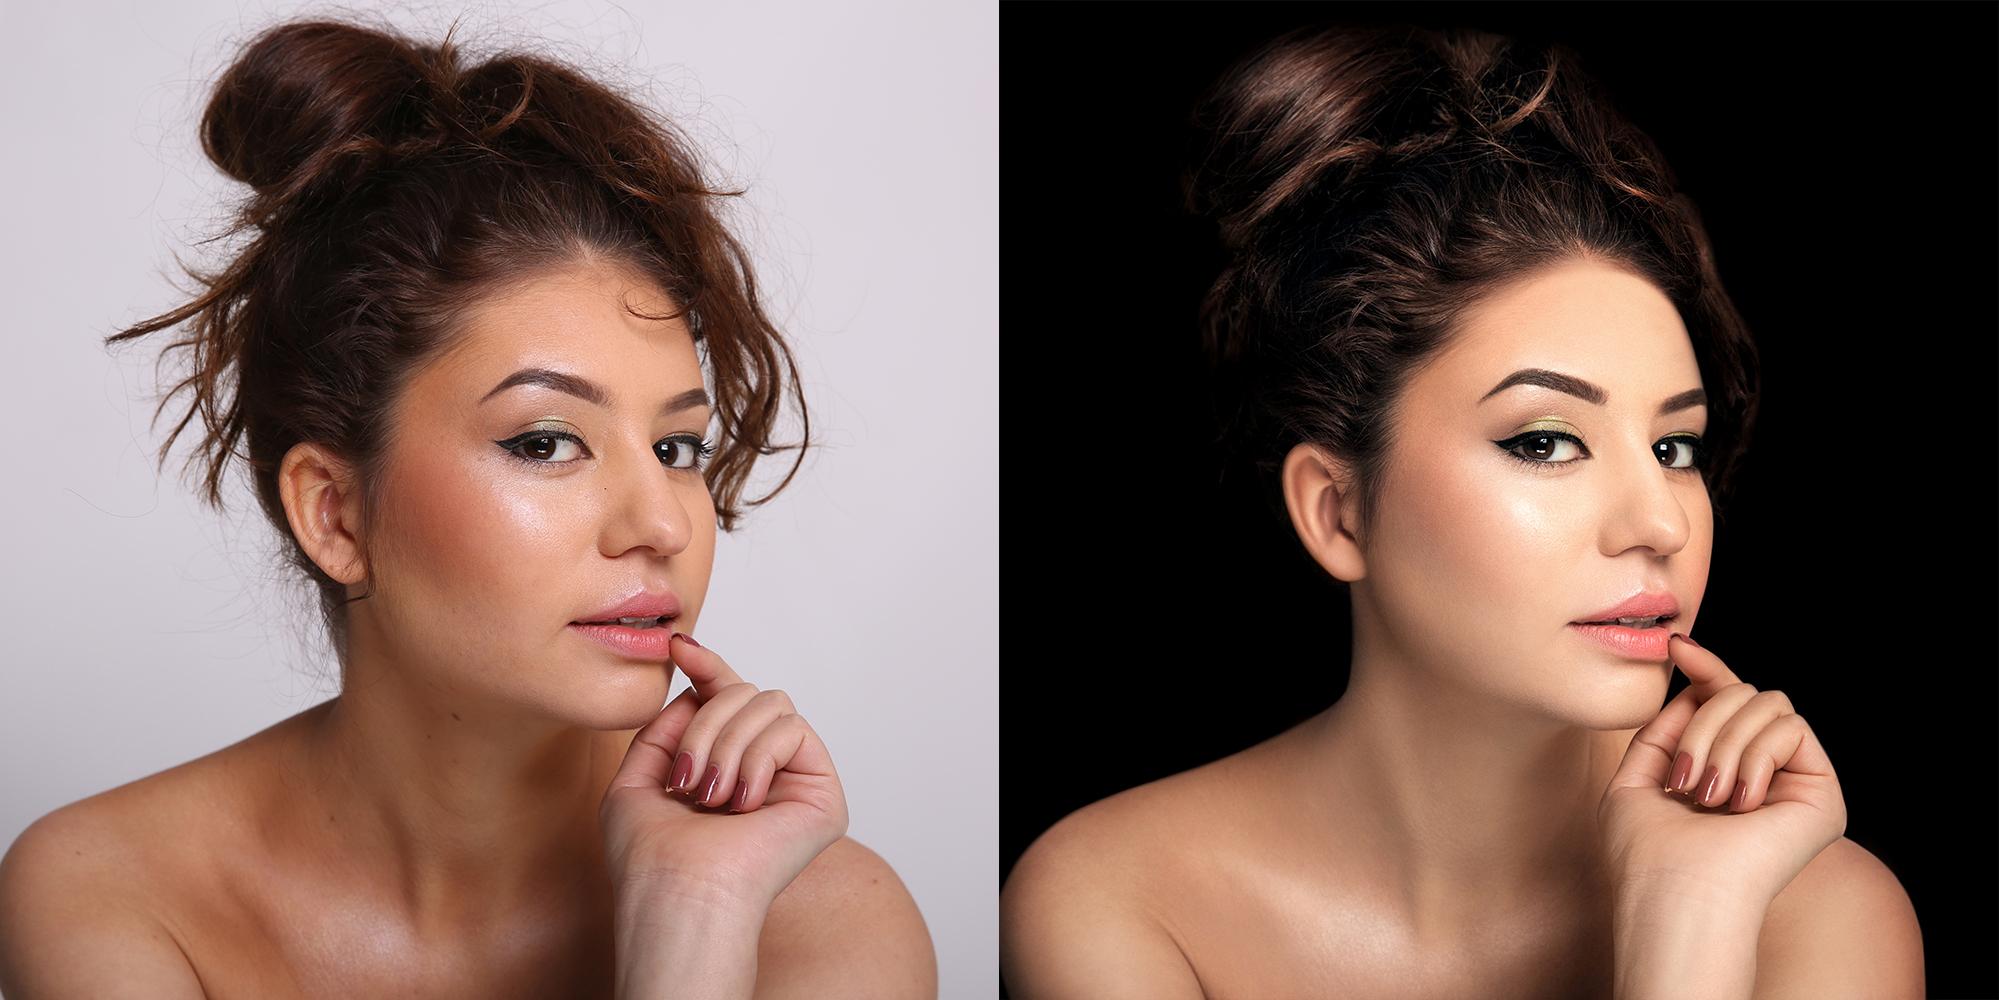 online-photo-editing-background-change-before.jpg